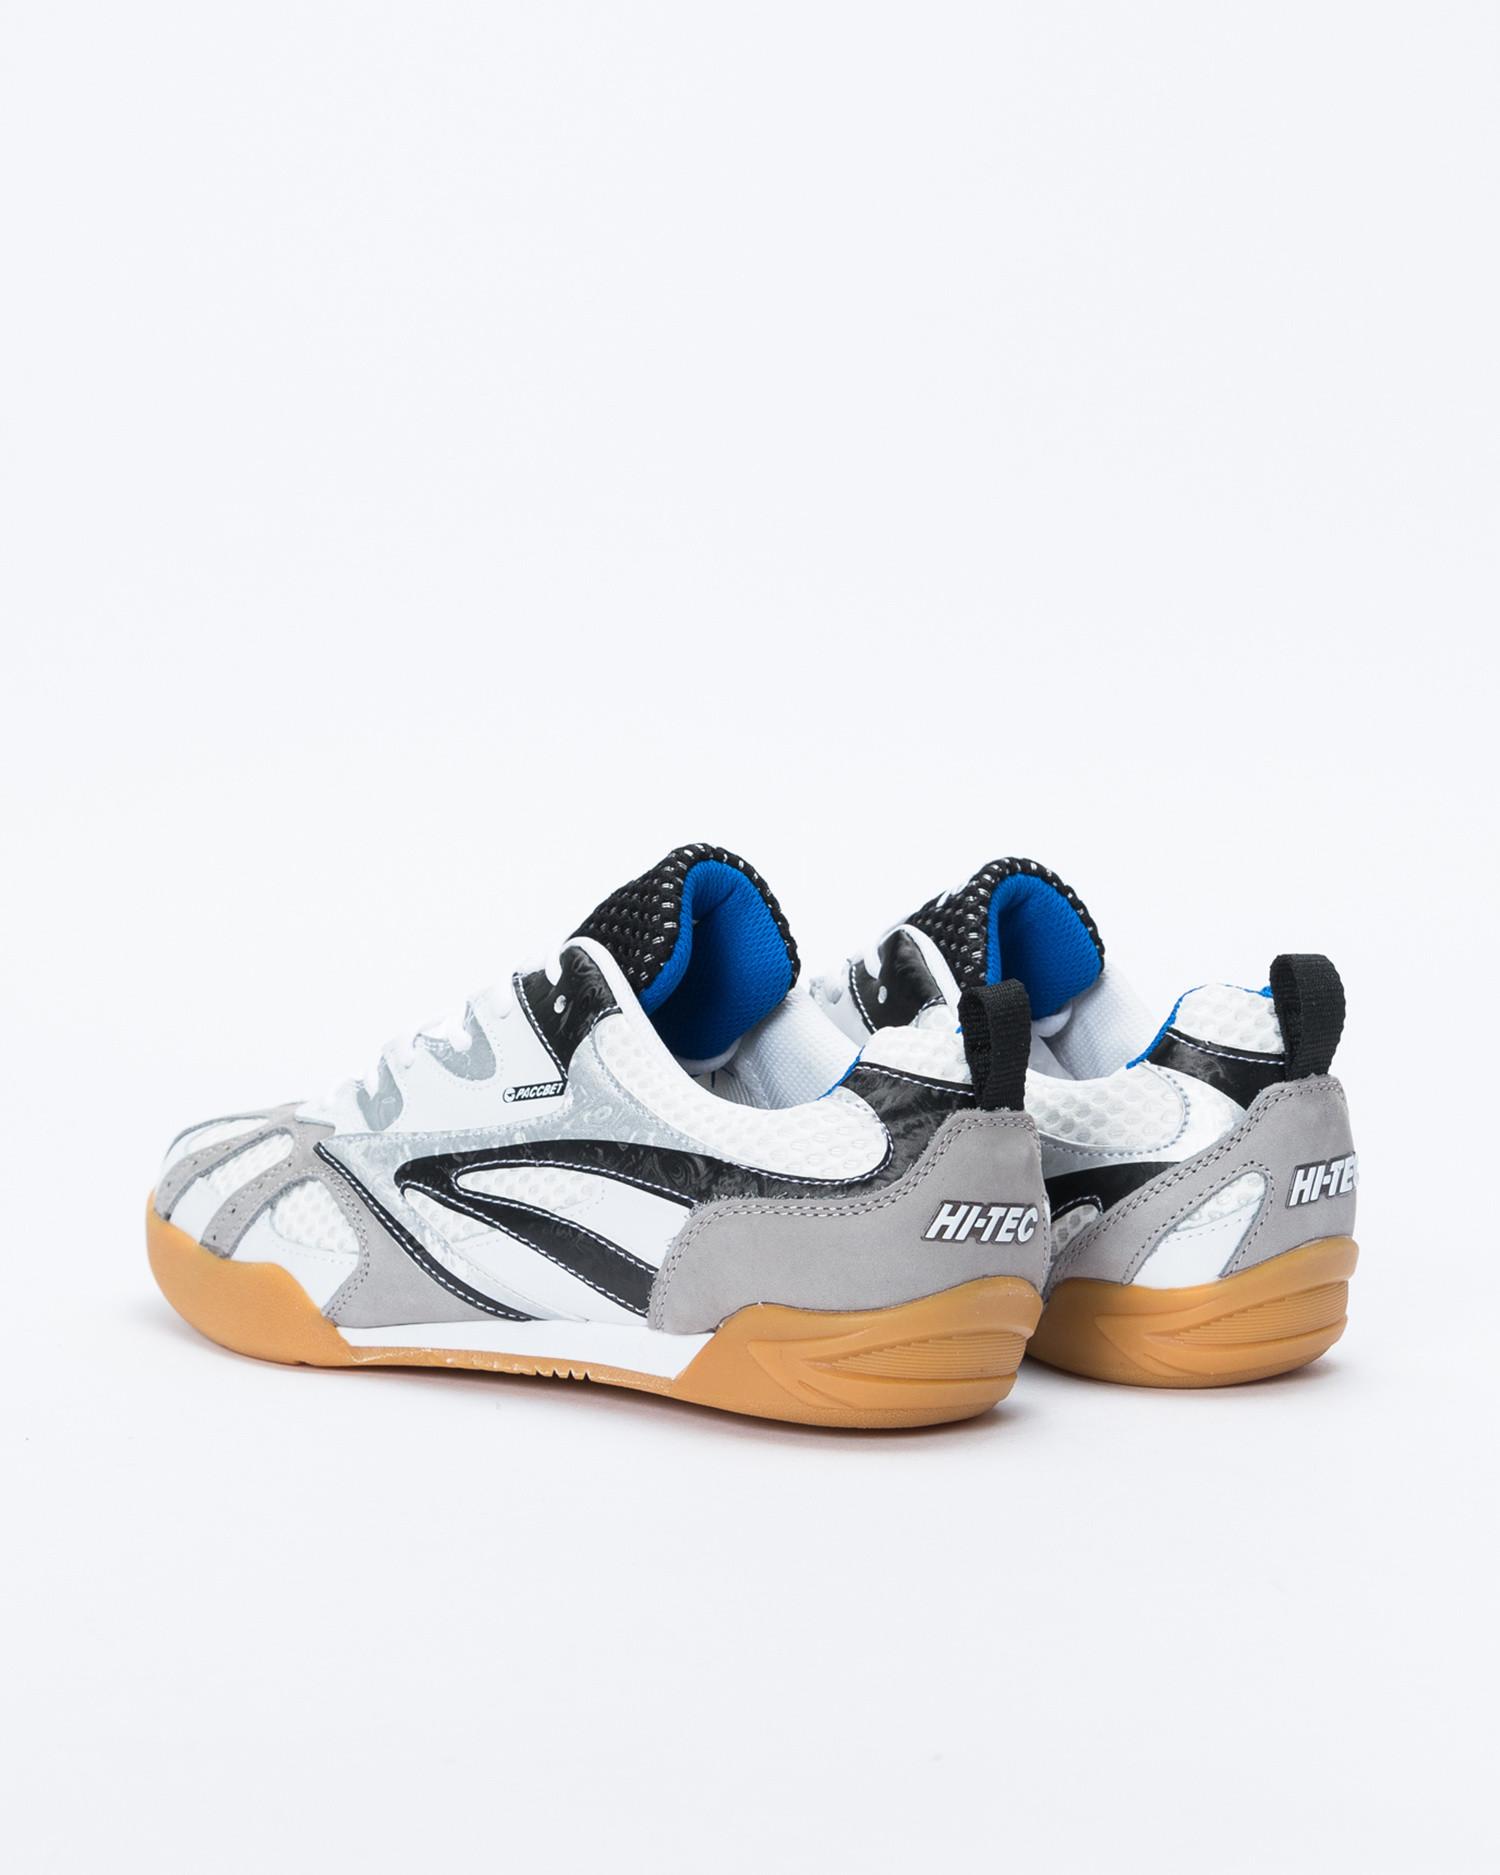 Paccbet X Hi-Tech Hybrid Squash Shoe White